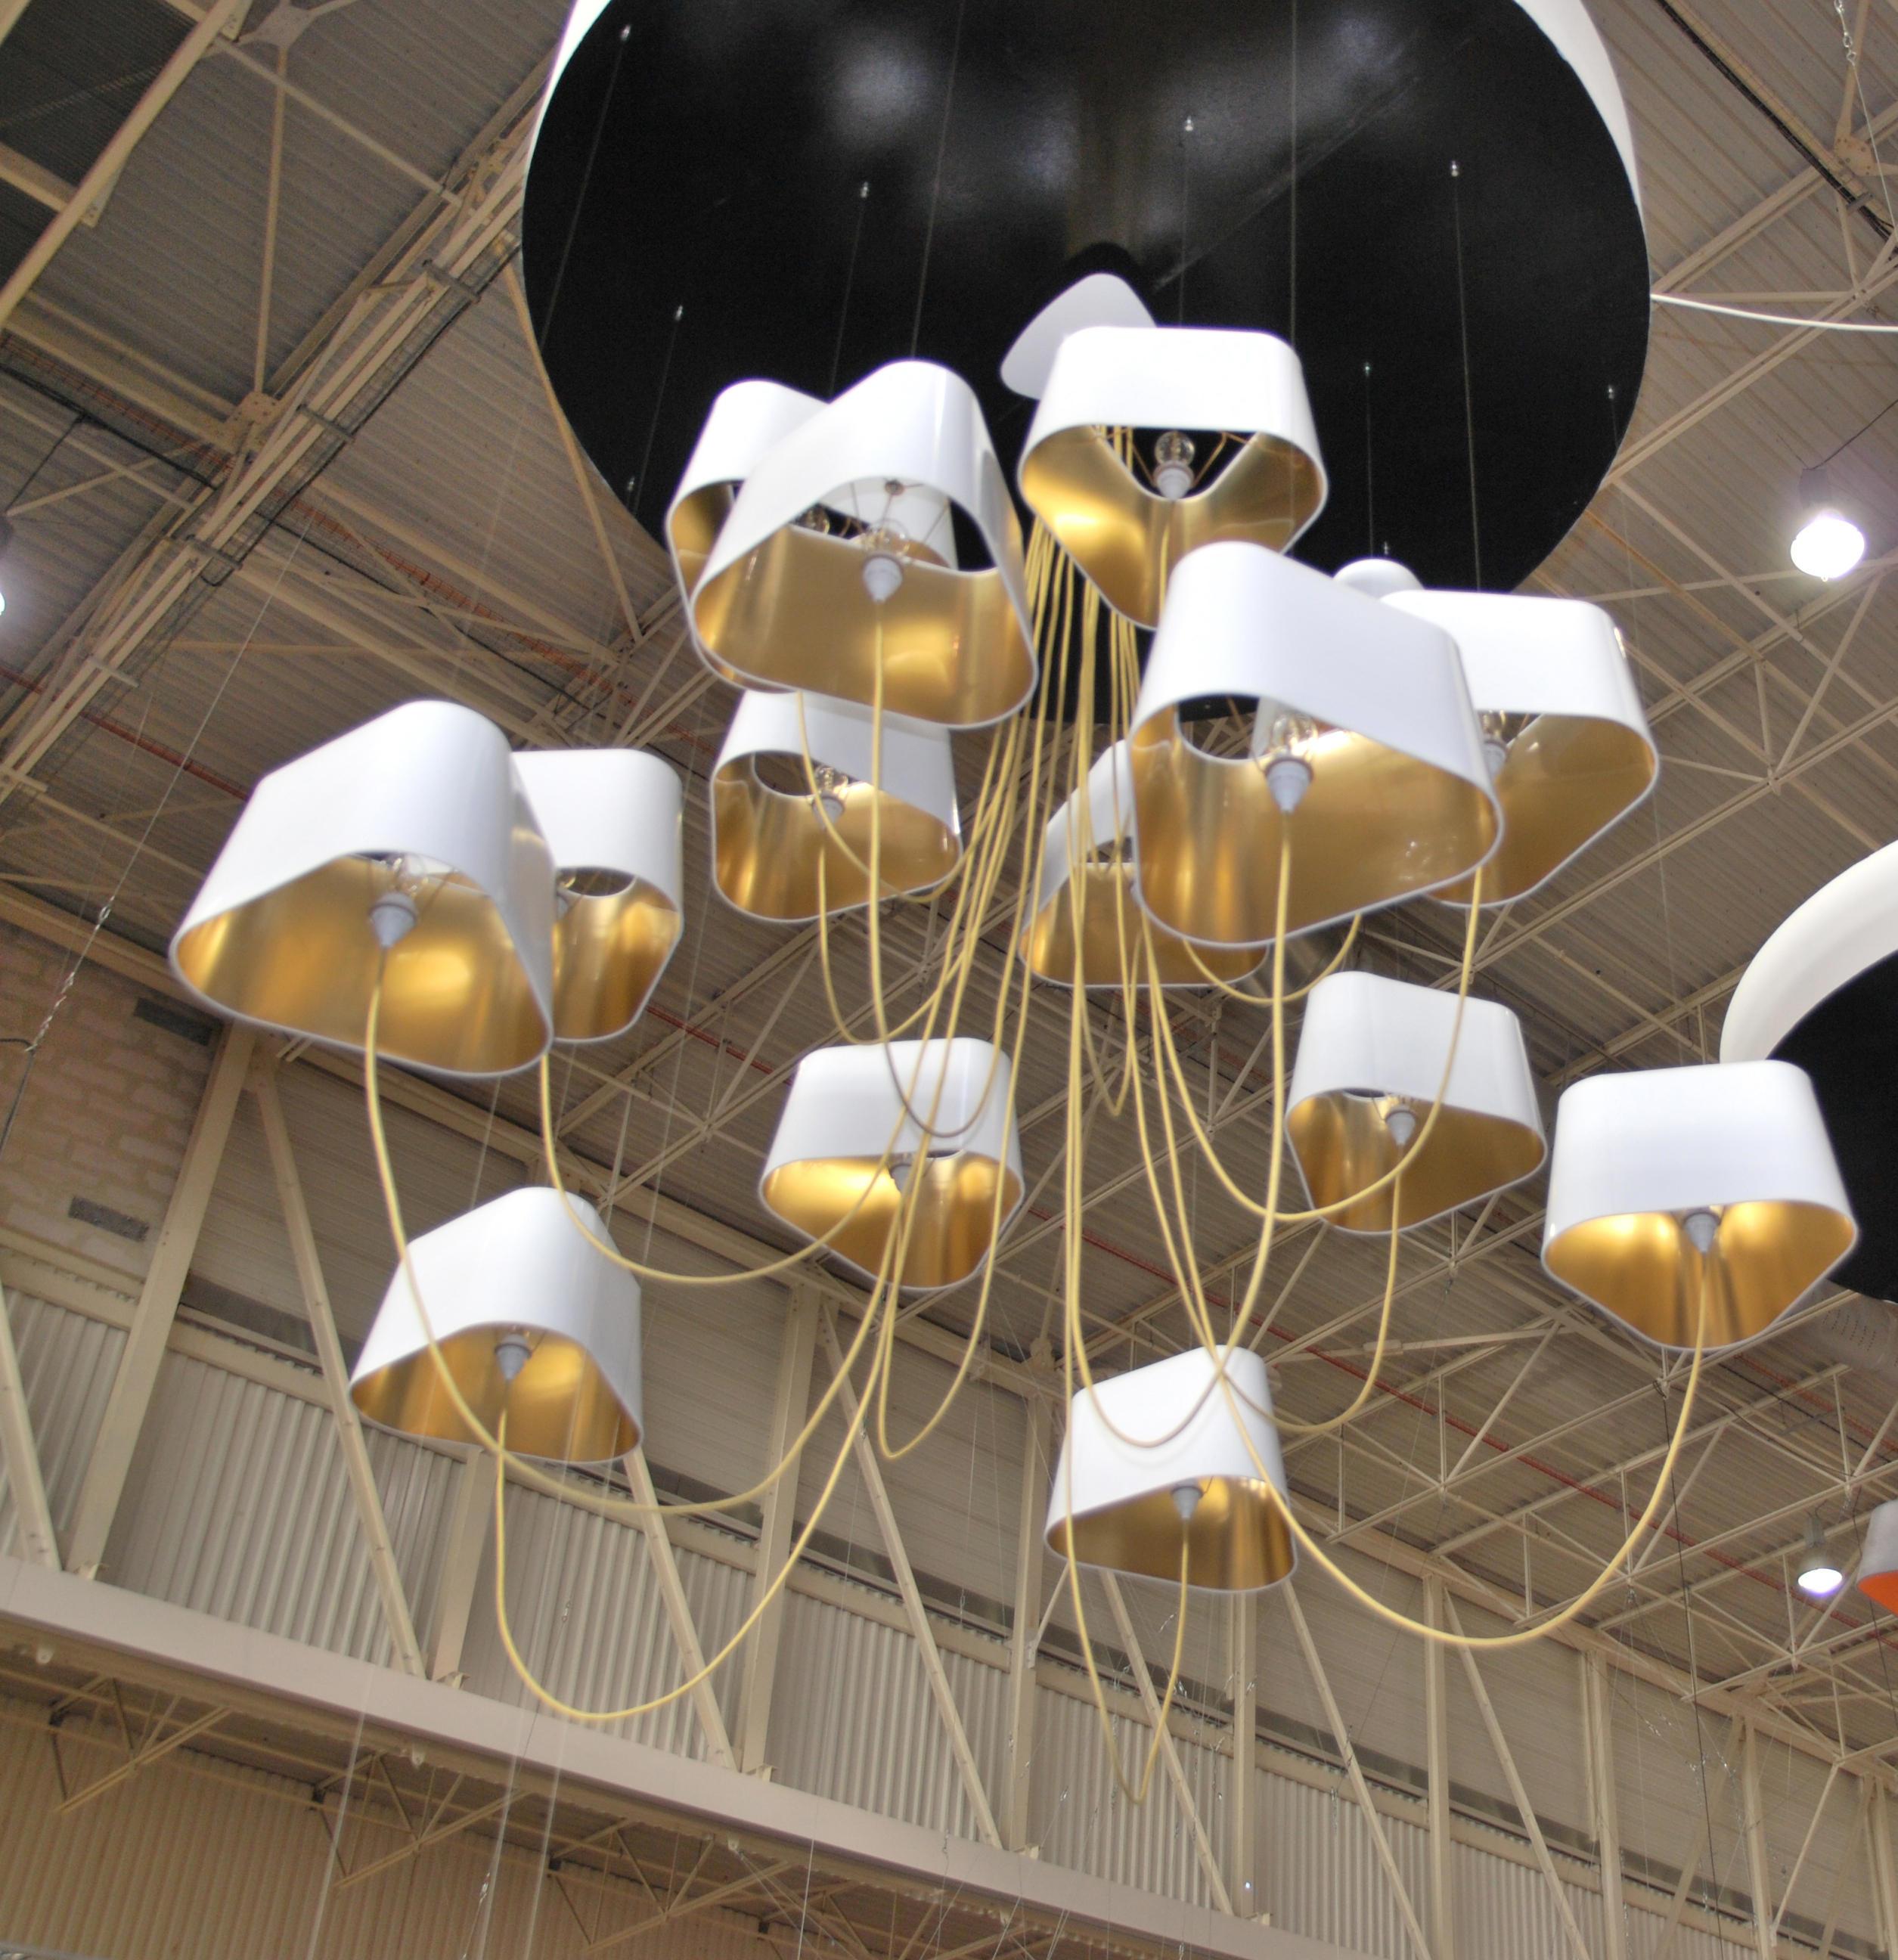 nuage lustre 6 petit lustres suspendus de designheure. Black Bedroom Furniture Sets. Home Design Ideas